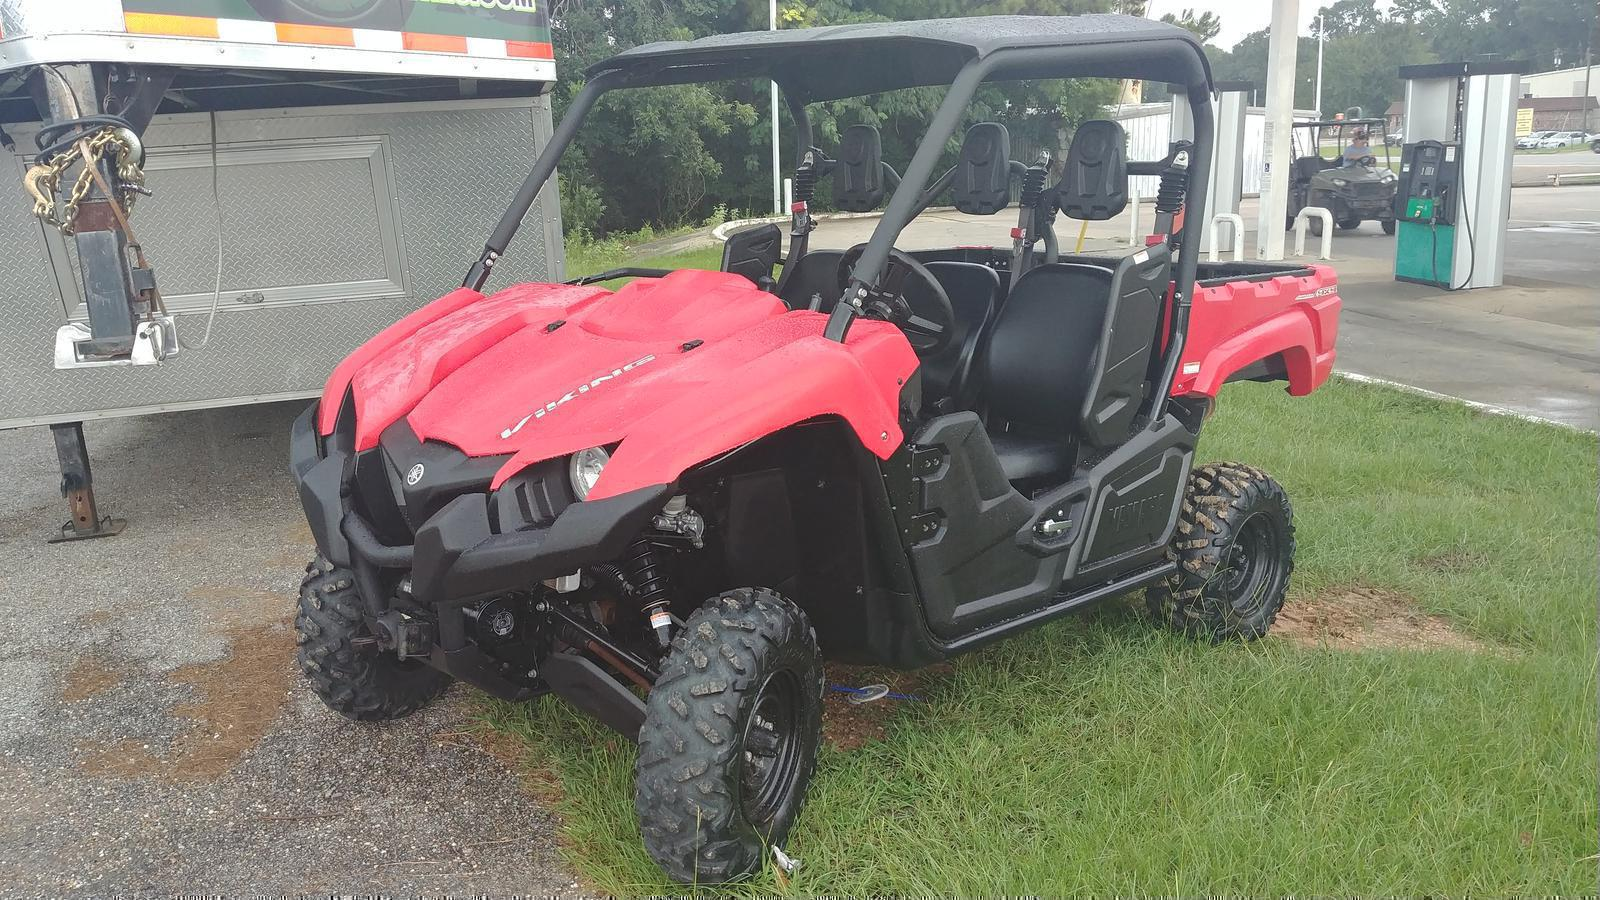 Inventory PRO FLOW MOTORSPORTS LLC Laurel, MS (601) 425-2484